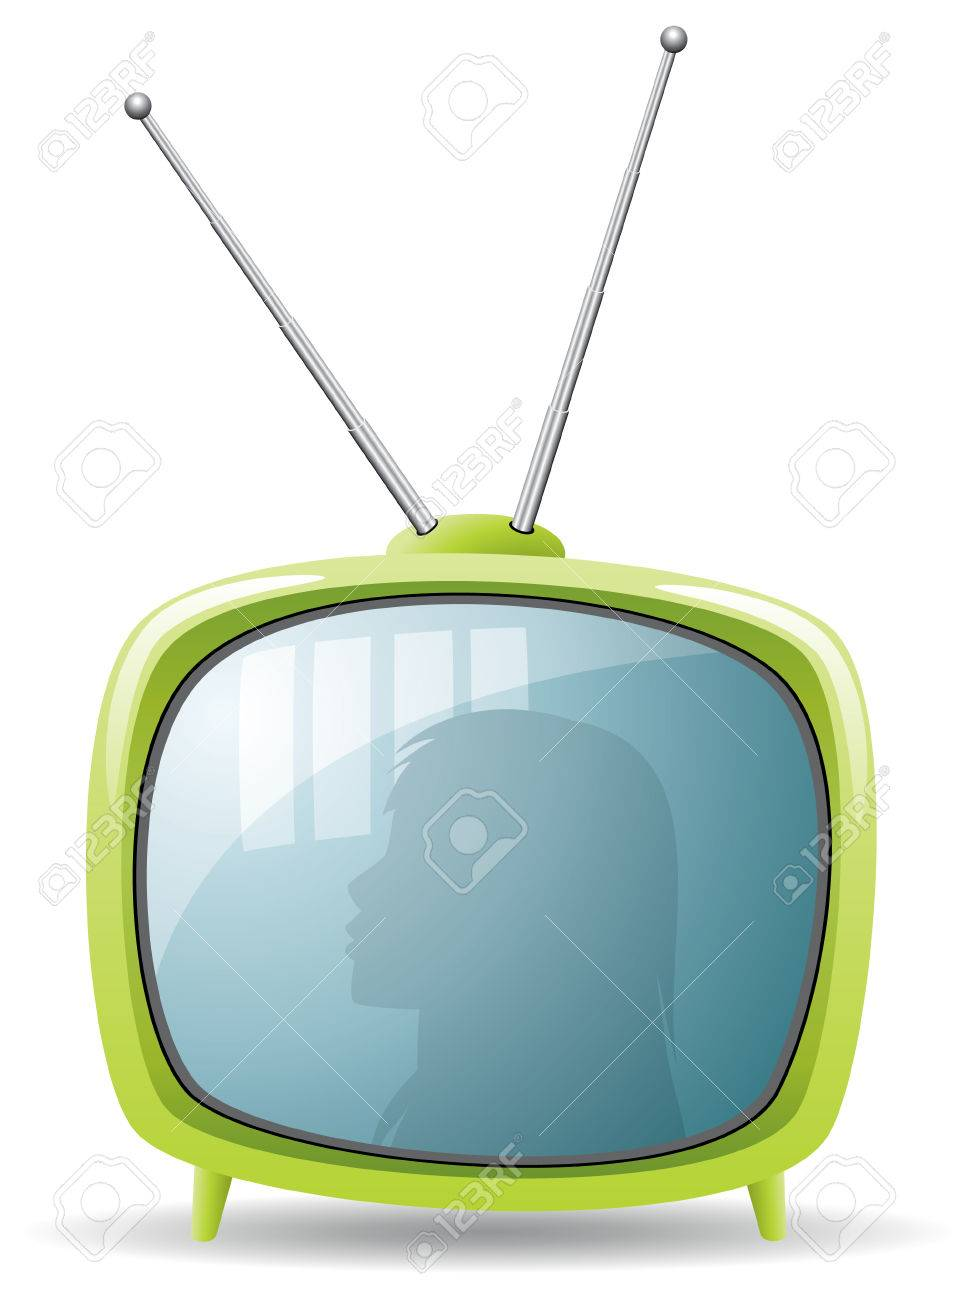 vector green retro tv set - 8492735